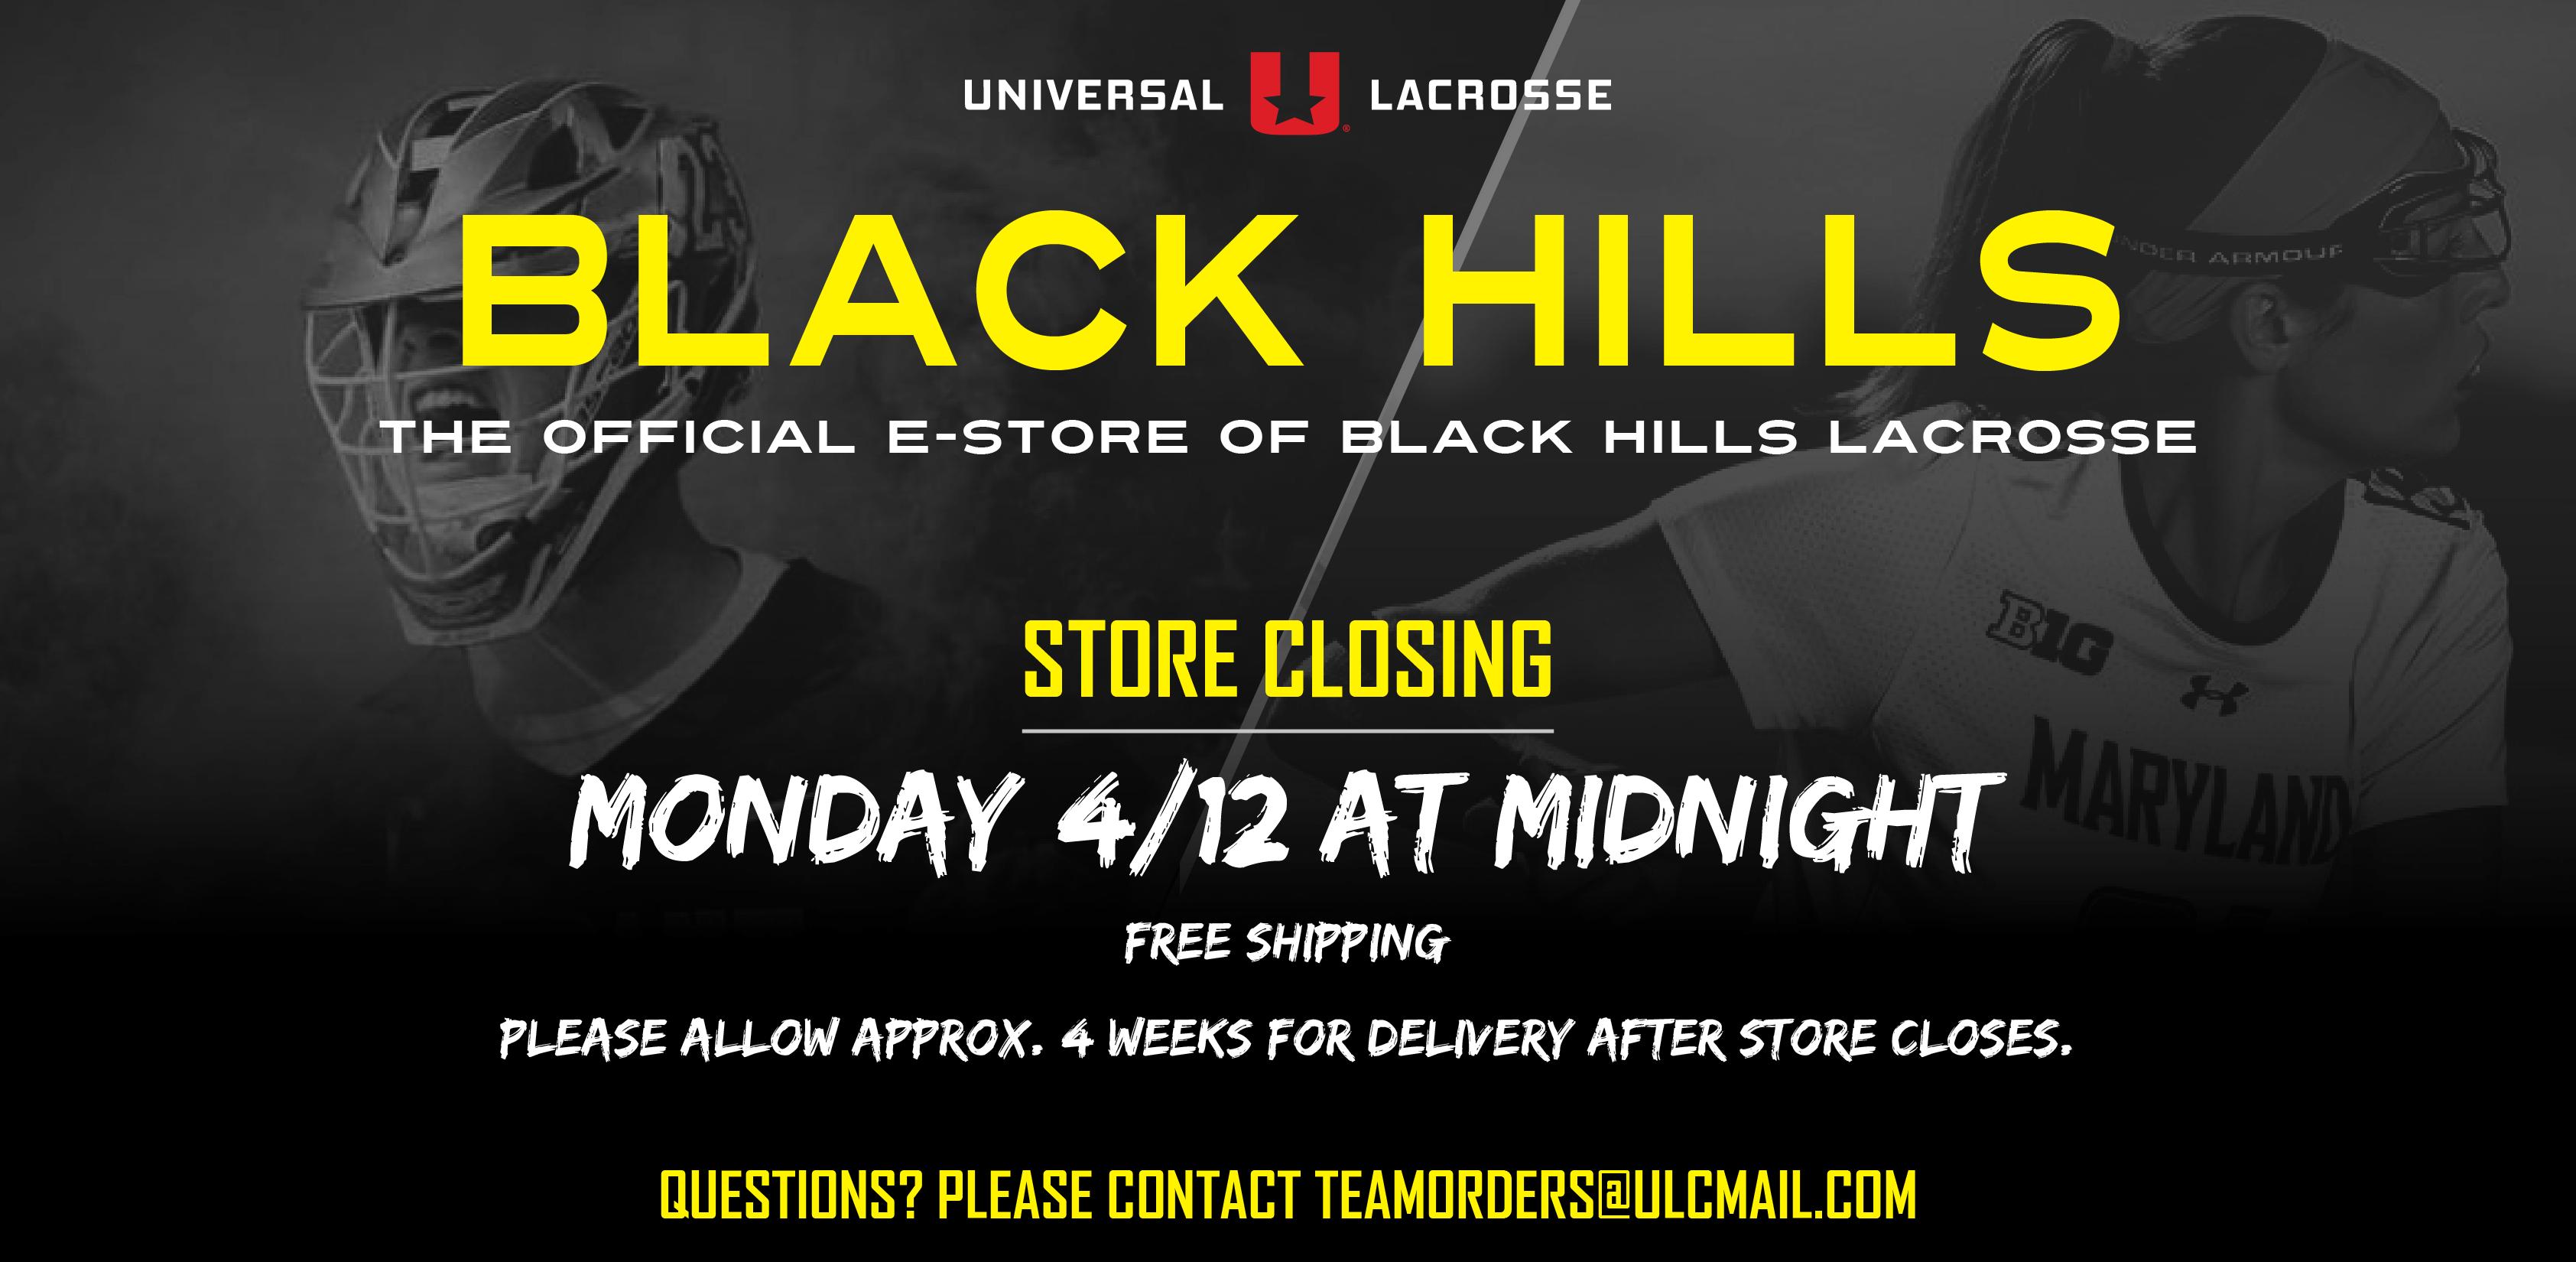 Black Hills Lacrosse